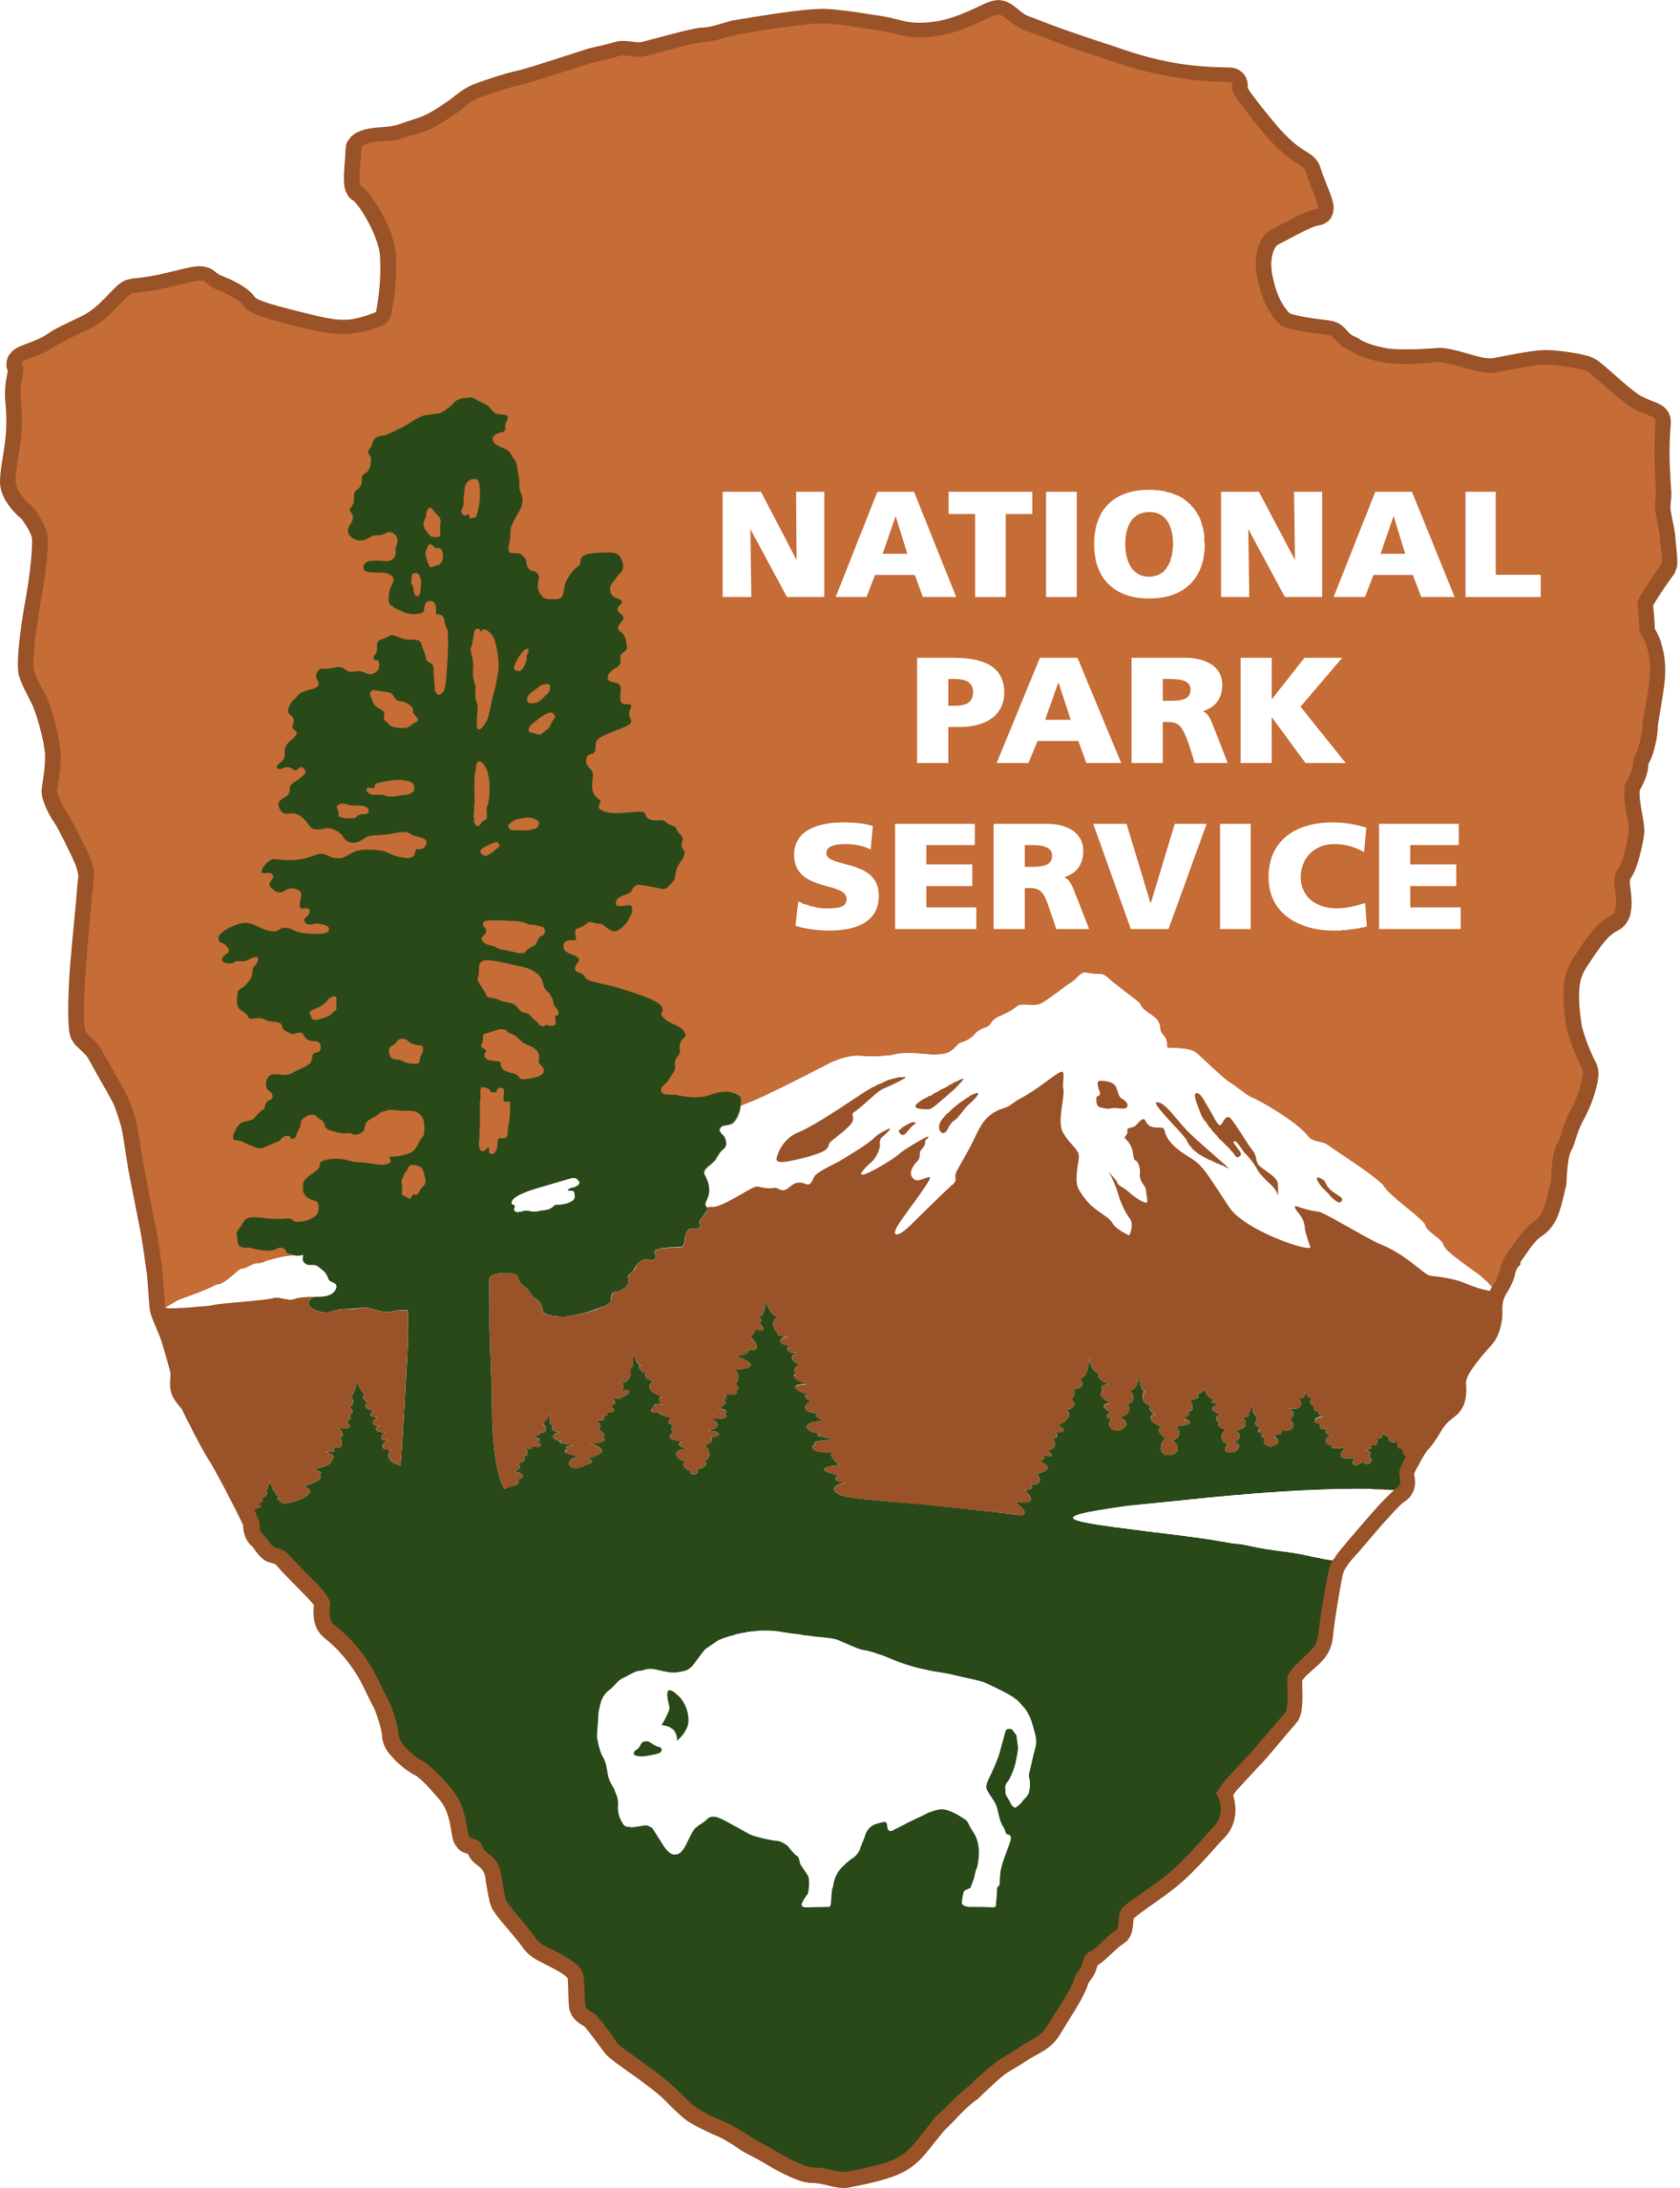 NPS.gov Homepage (U.S. National Park Service)